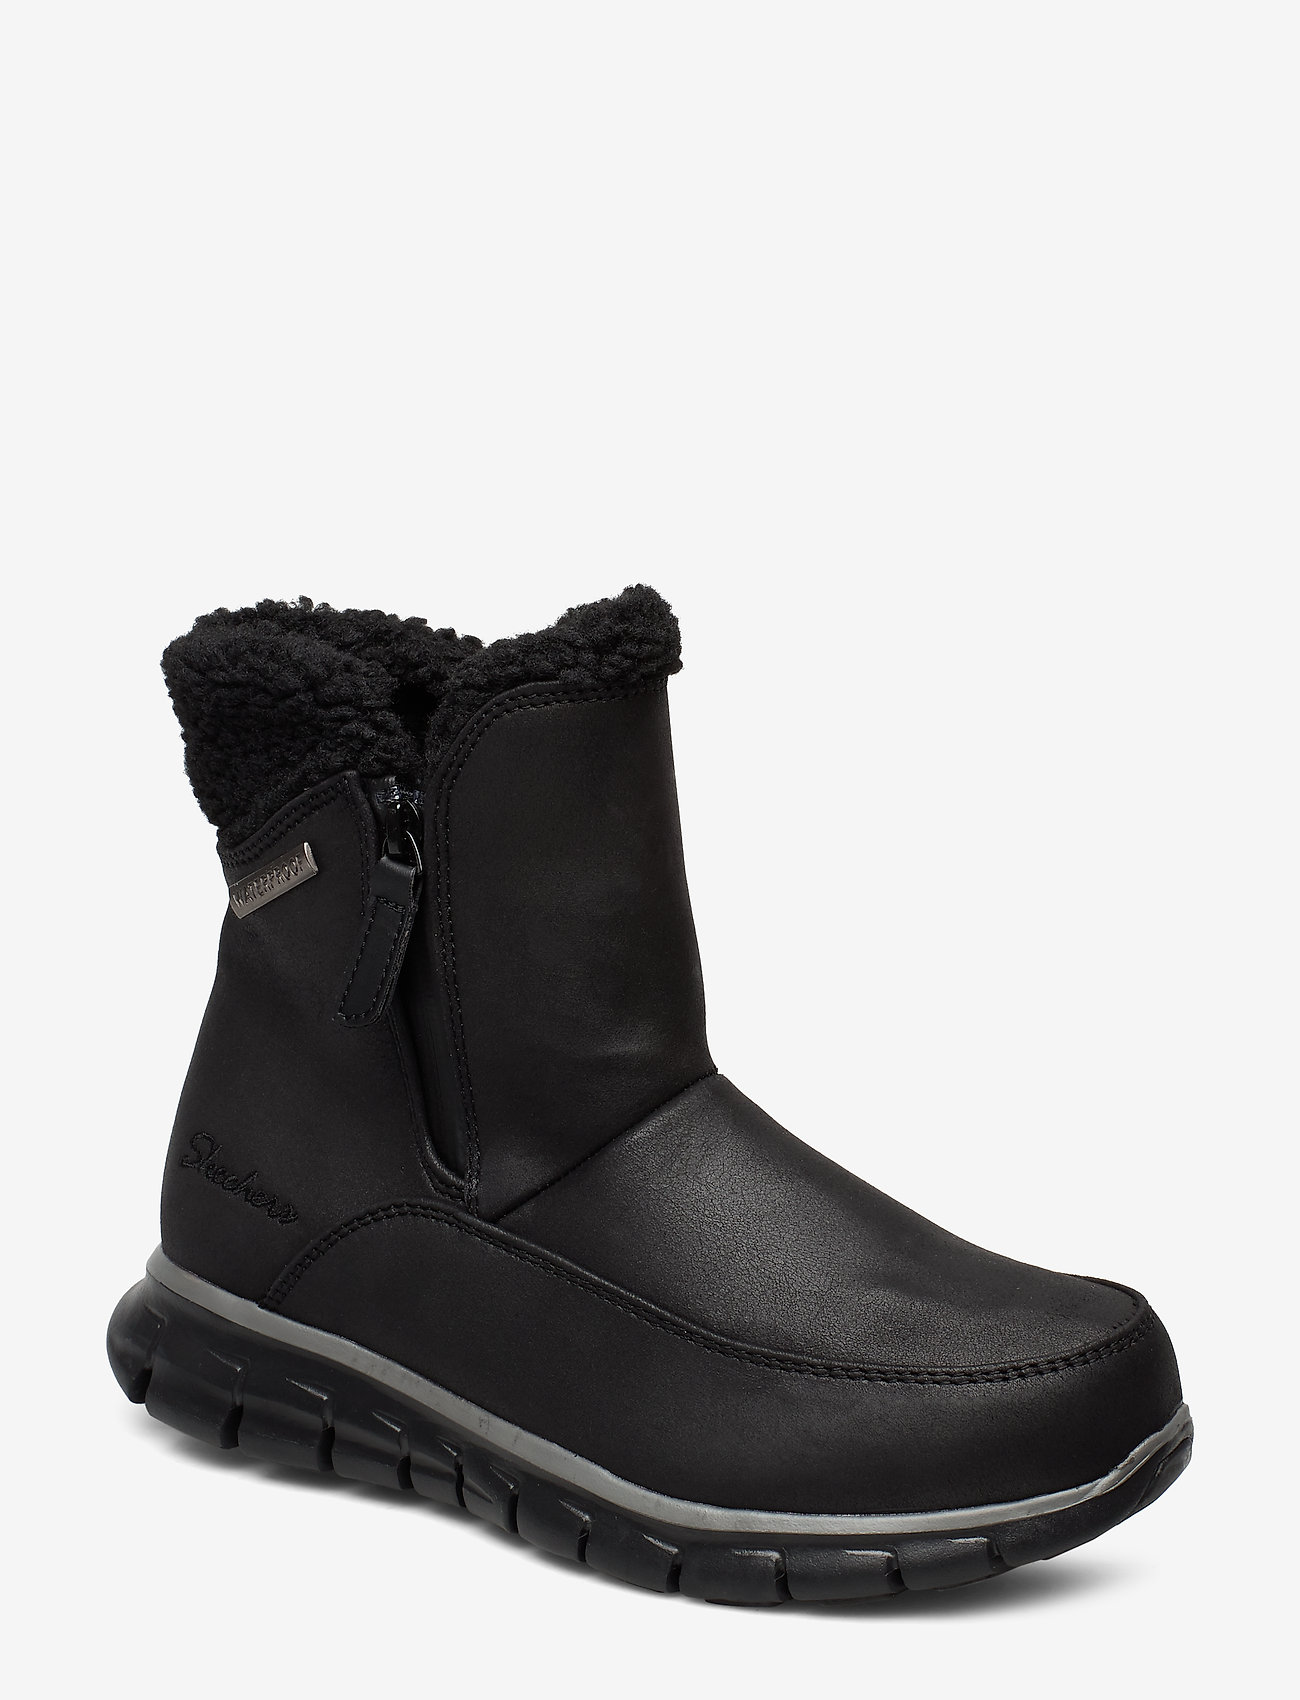 Skechers - Womens Synergy - Waterproof - flade ankelstøvler - bbk black - 1